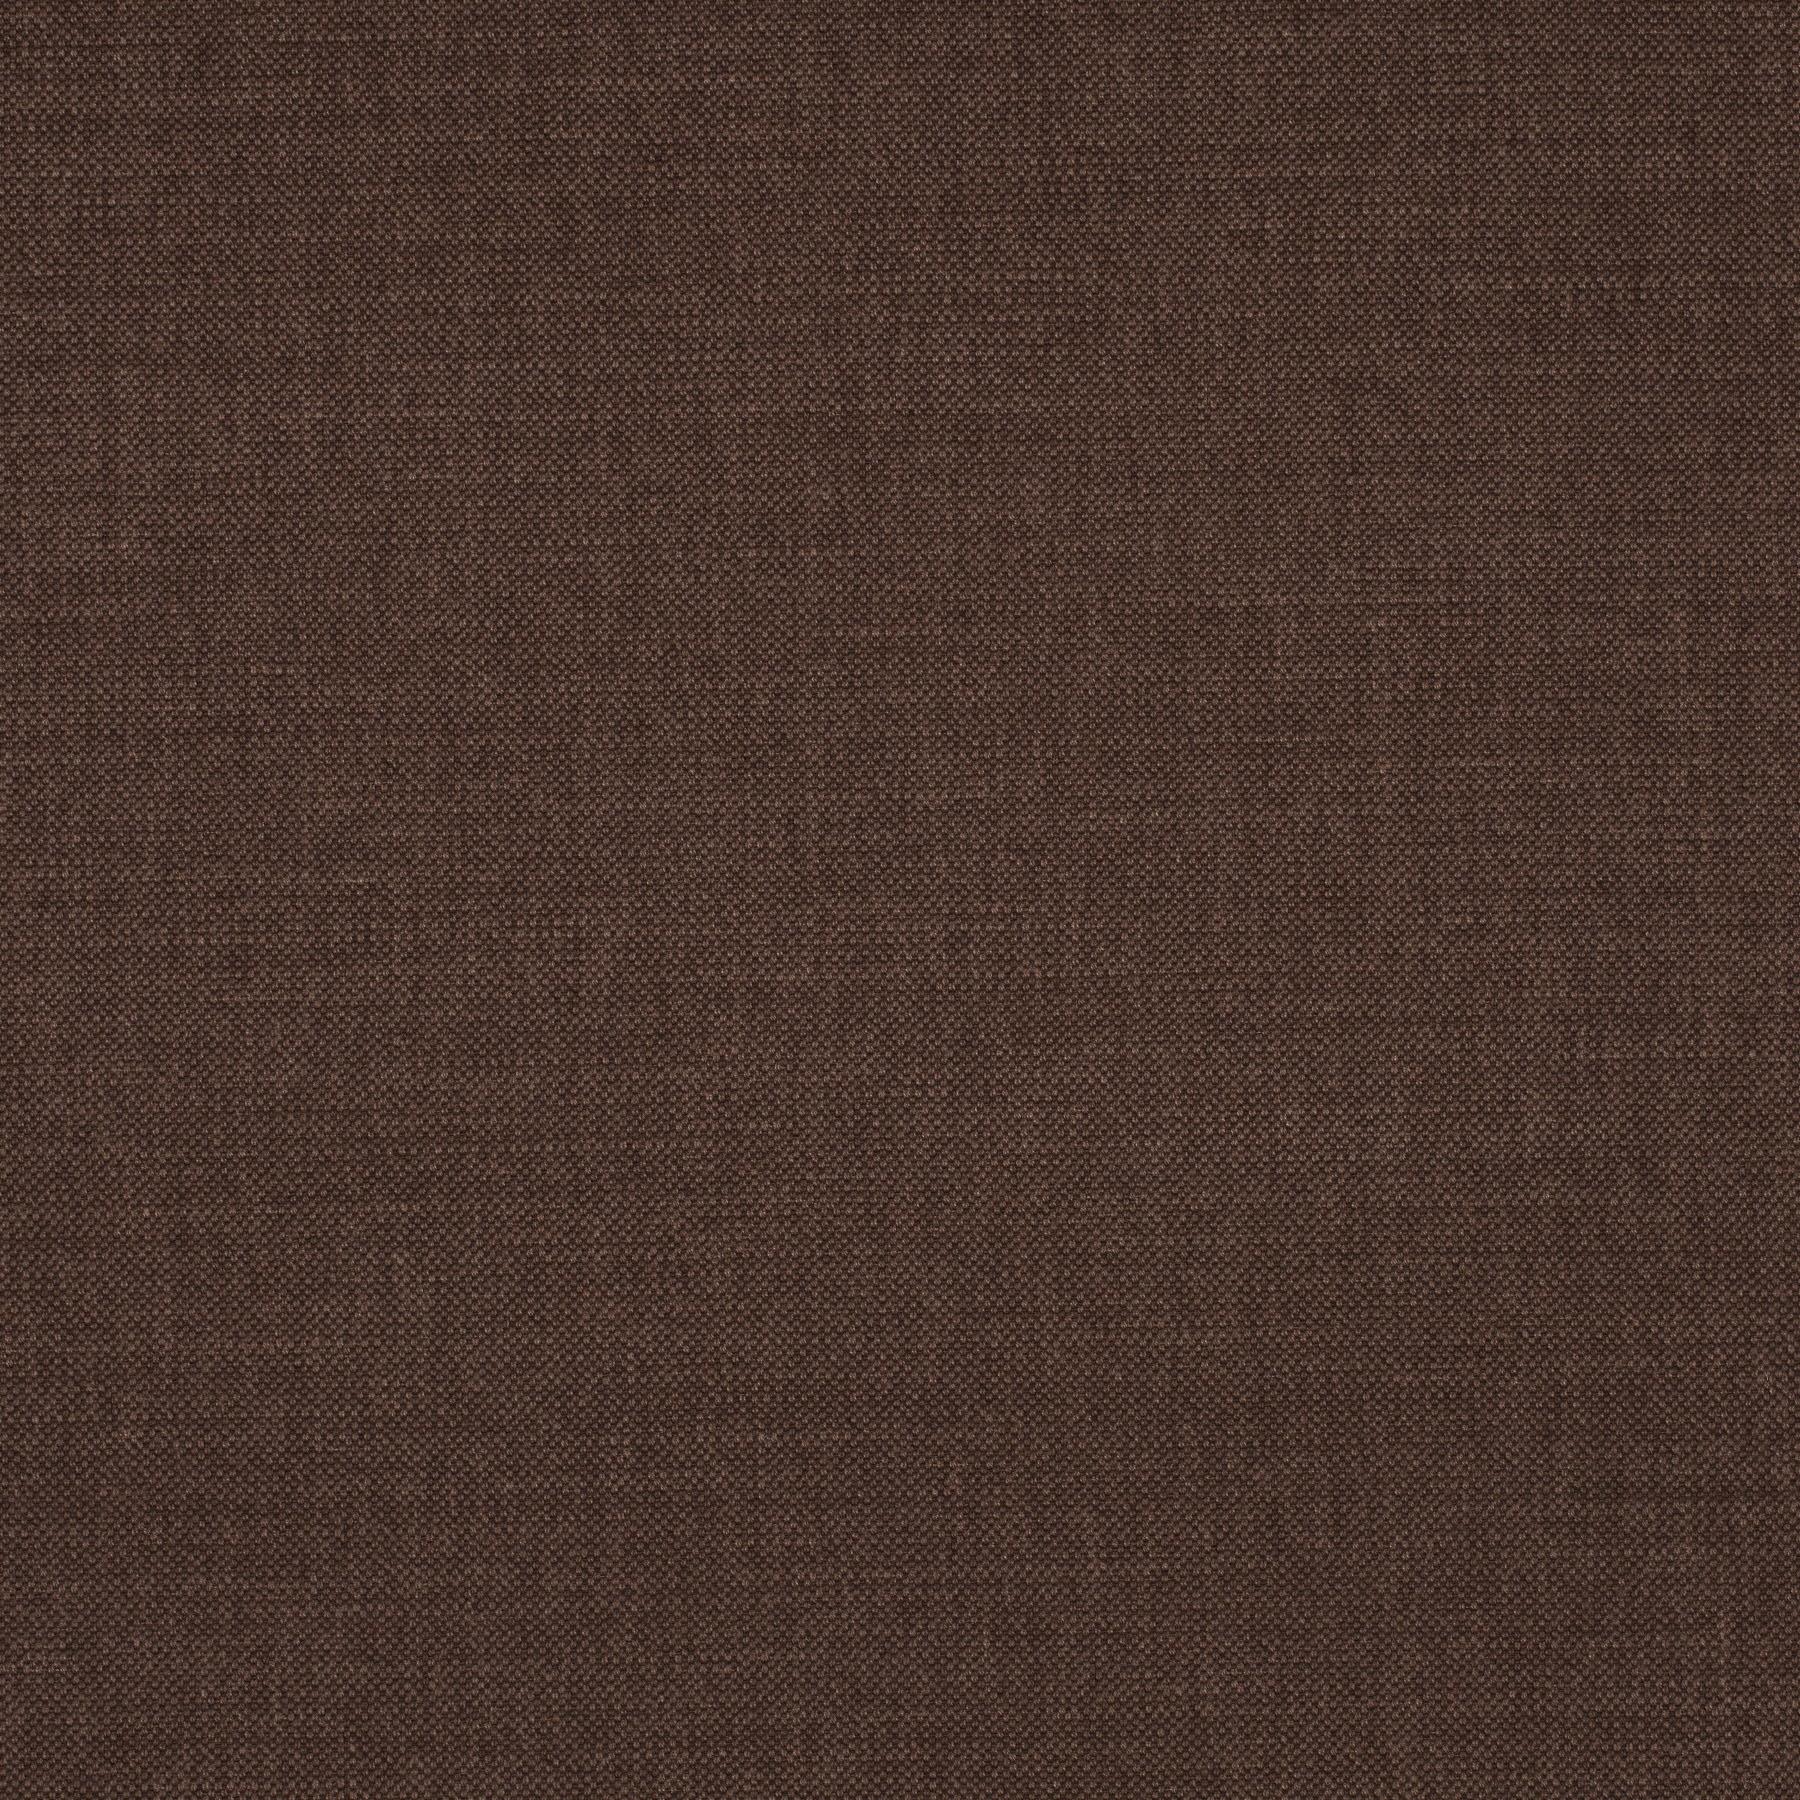 koks brun hot madison-0